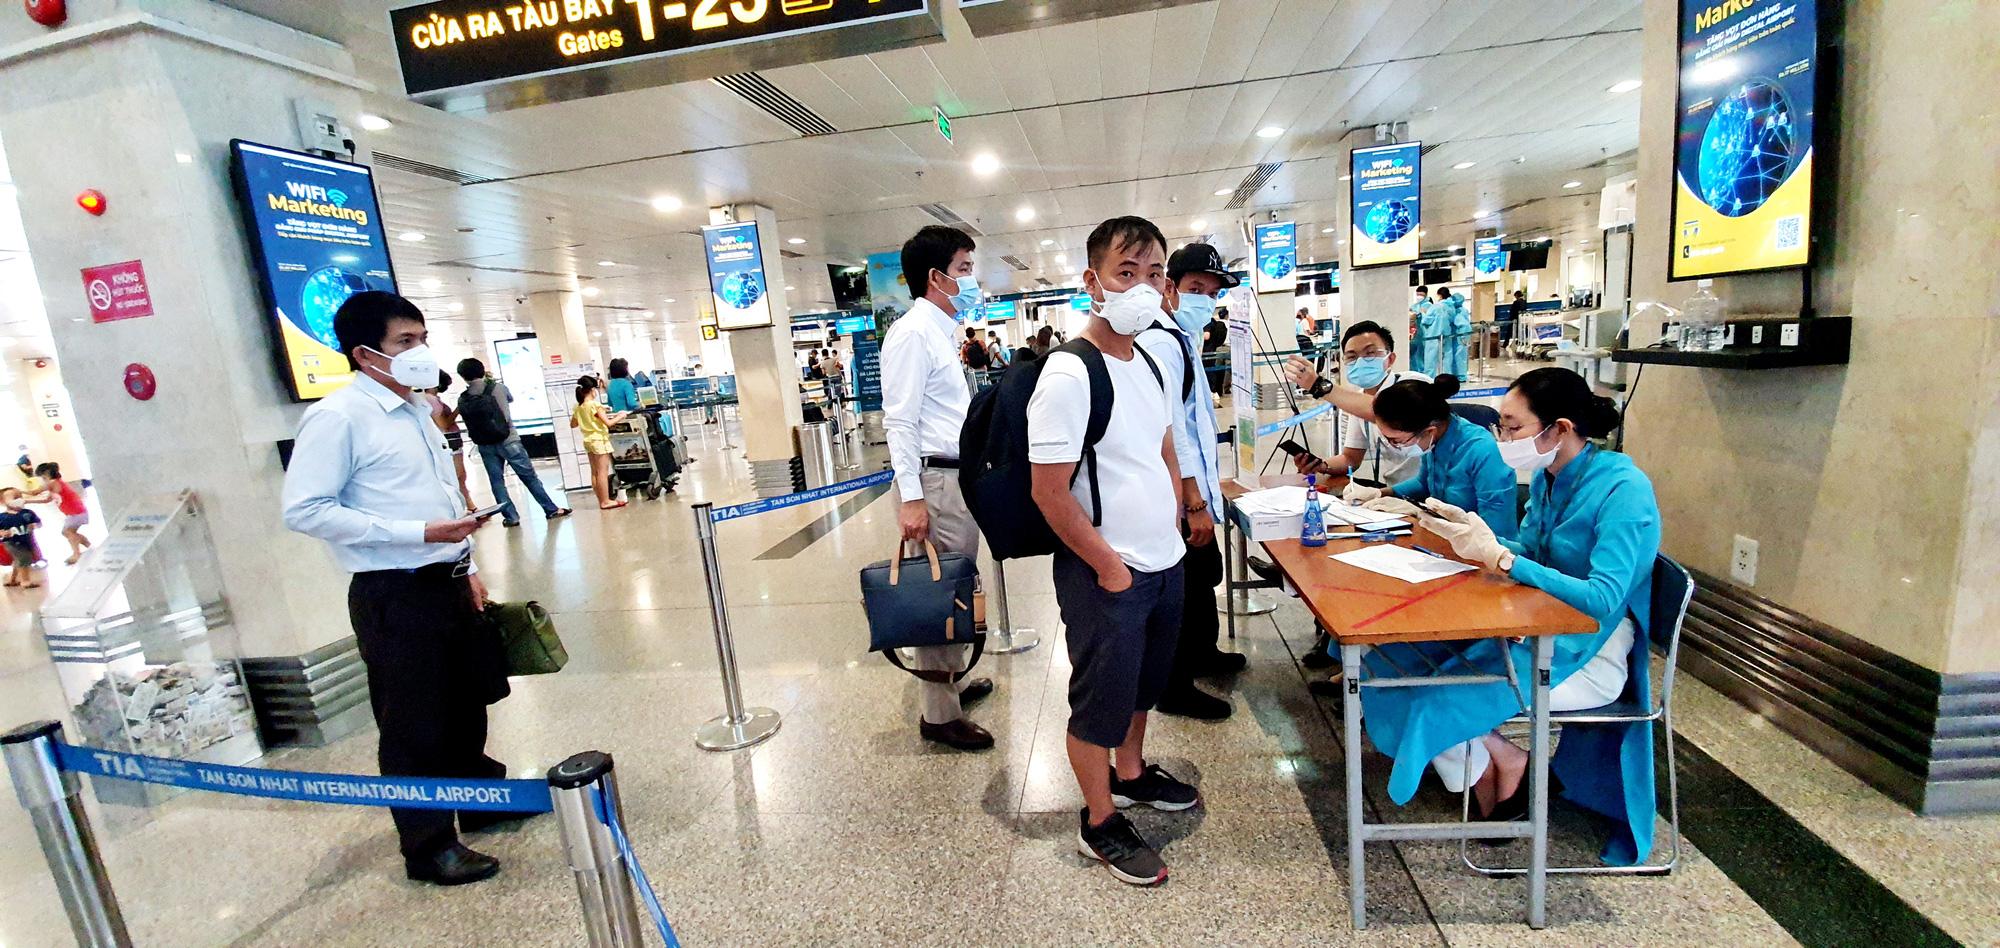 Ho Chi Minh City airport provides COVID-19 testing service